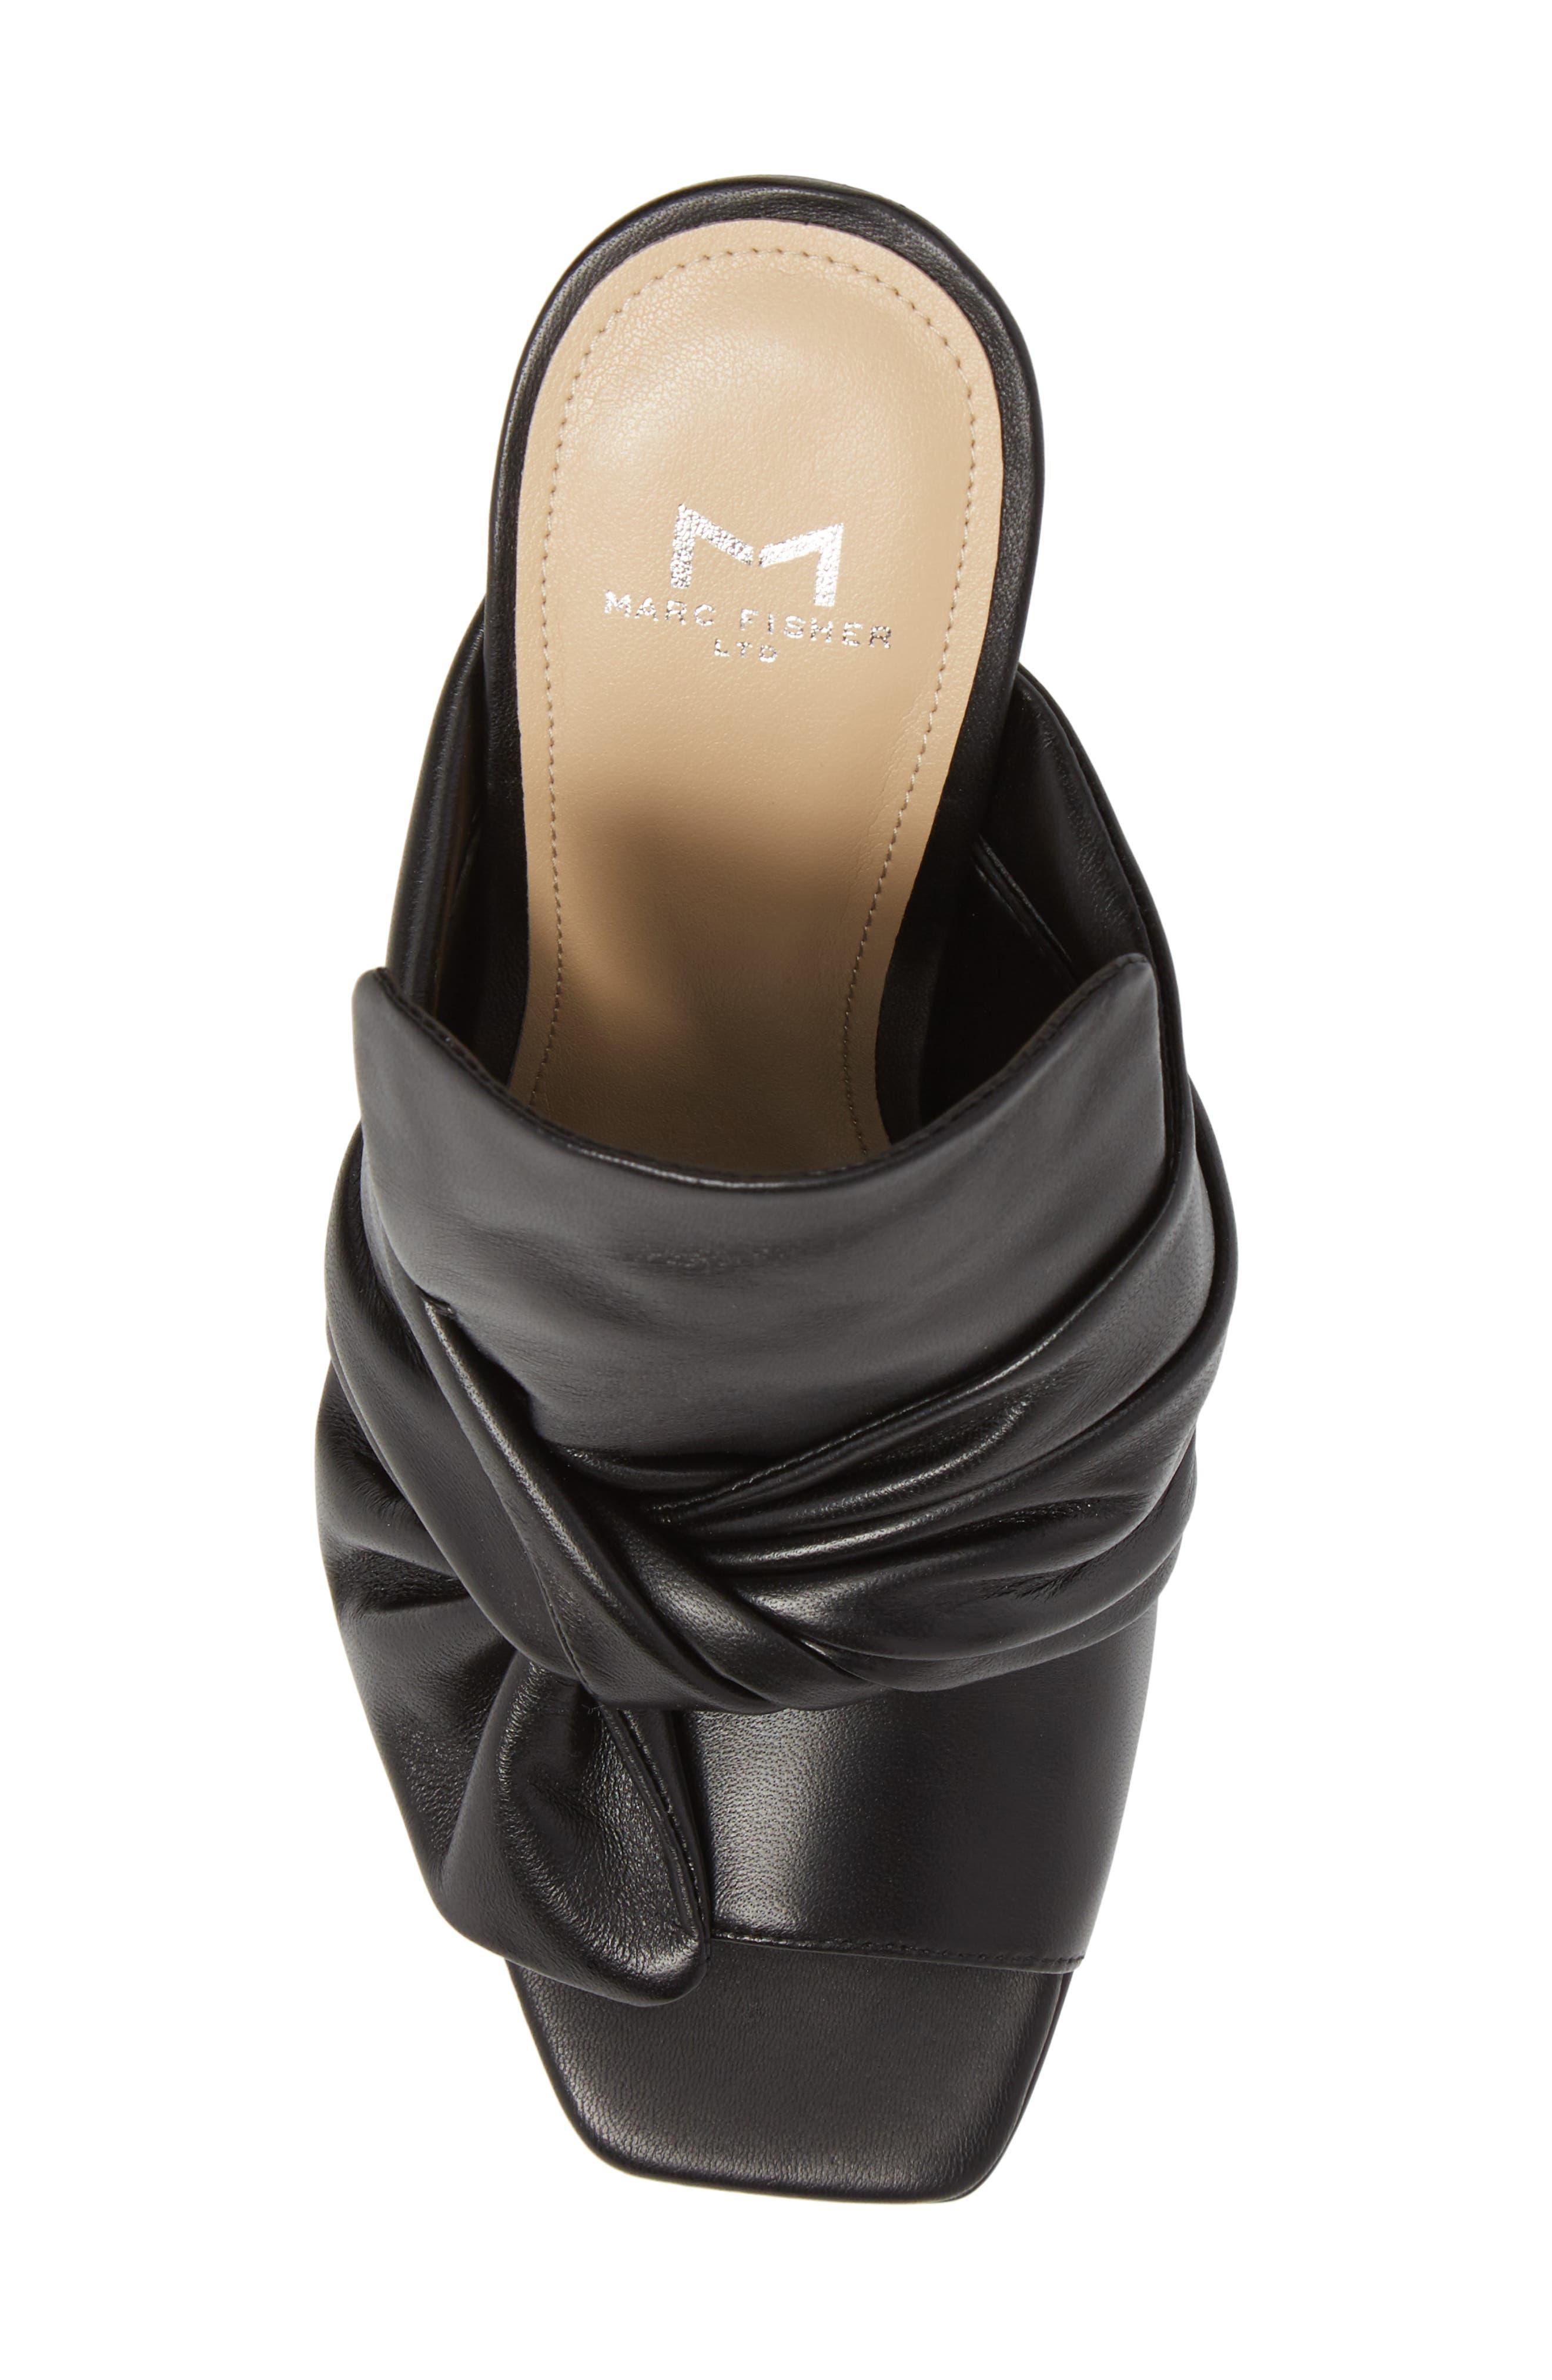 Hogan Sandal,                             Alternate thumbnail 5, color,                             Black Leather